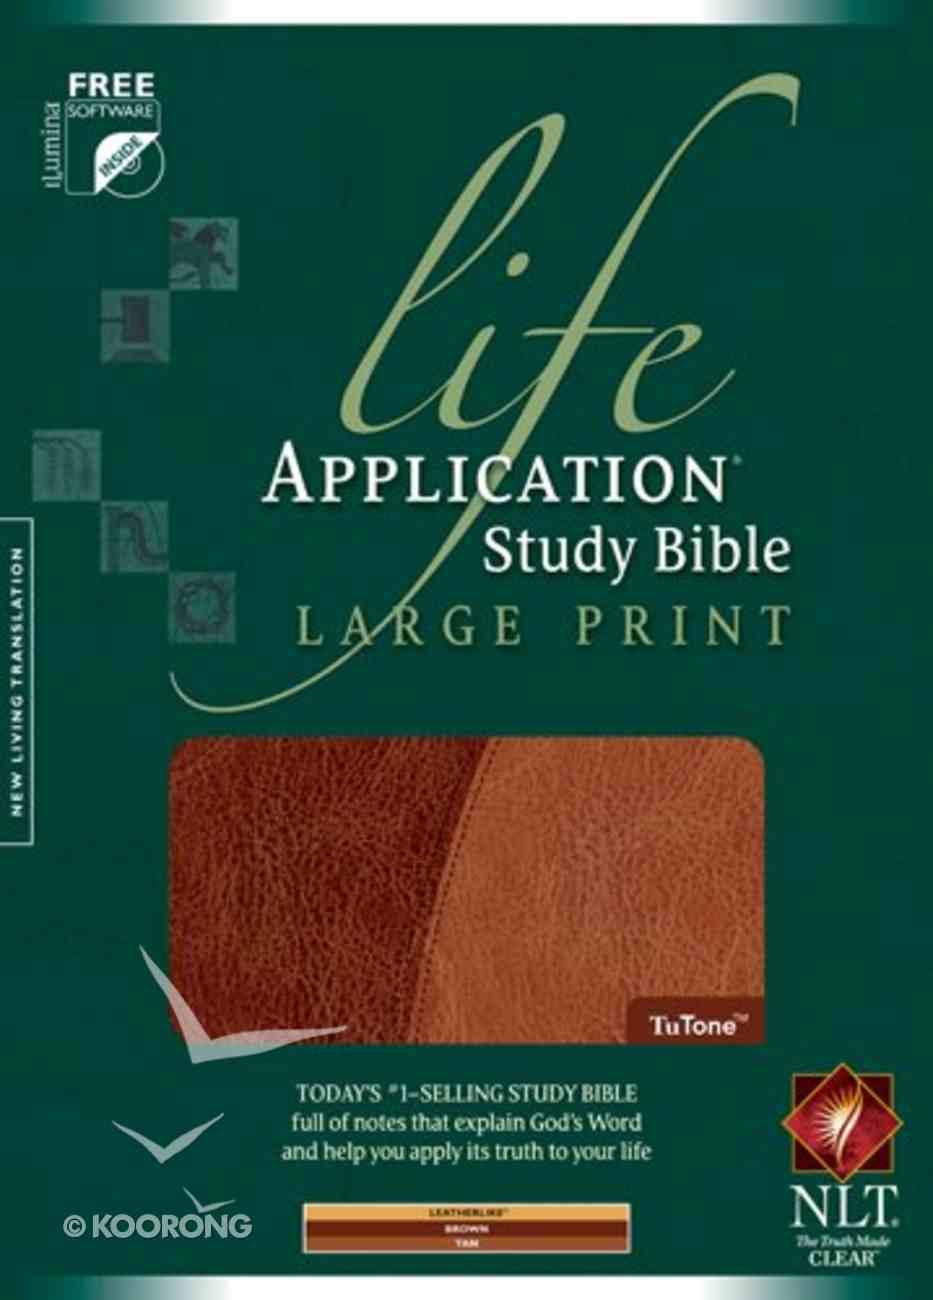 NLT Life Application Study Bible, Brown/Tan (Large Print) Imitation Leather